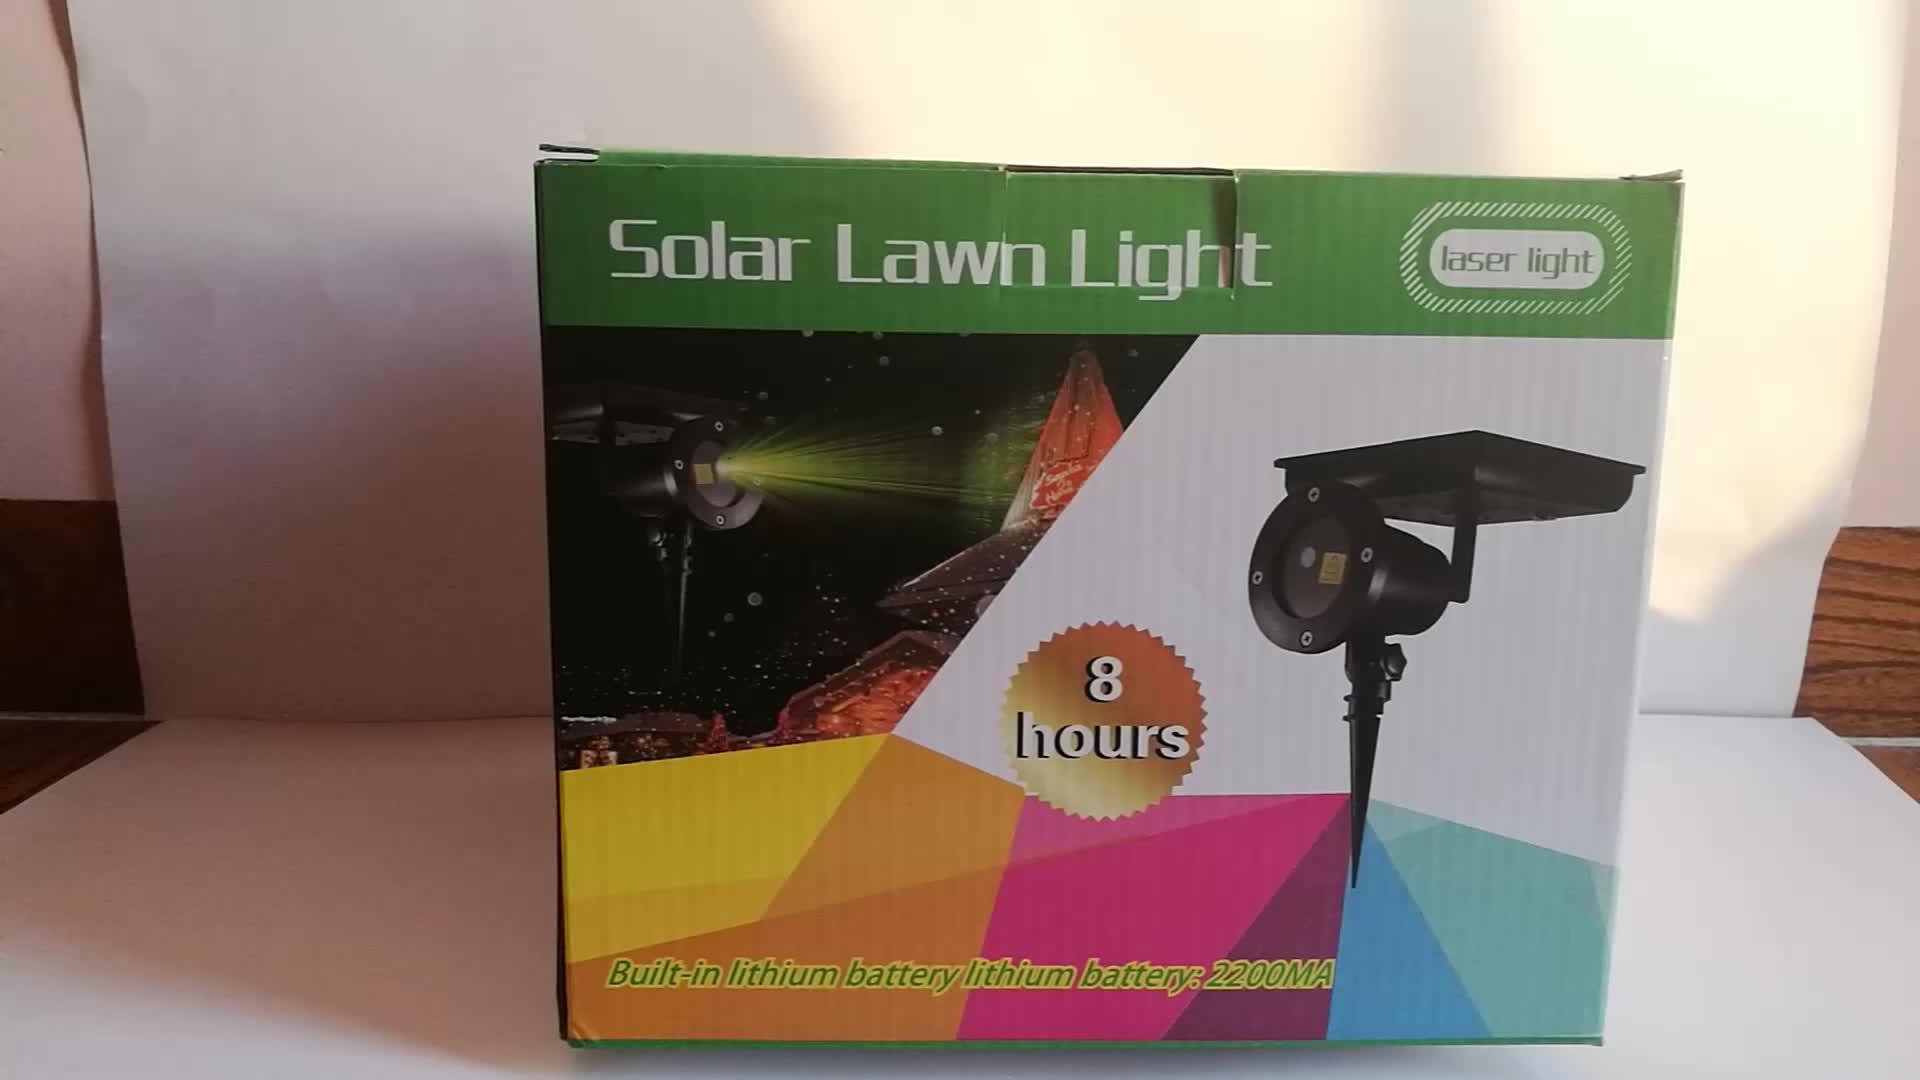 New 다기능 휴대용 온보드 방식이 solar power Christmas decoration 휴. laser 조명 solar led 빛